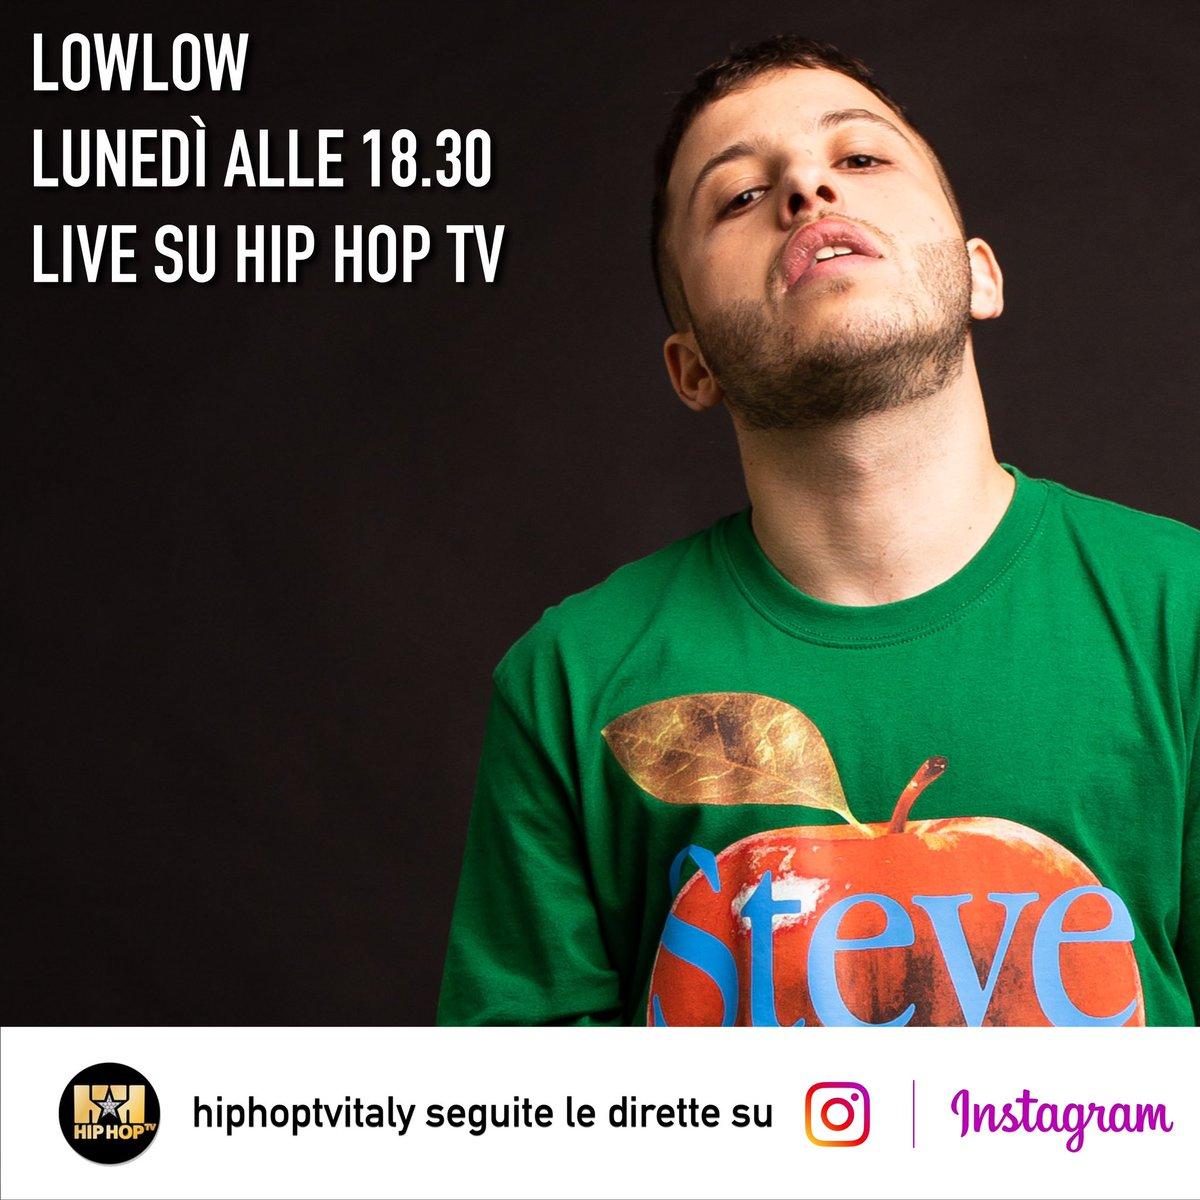 HIP HOP TV Italy on Twitter: